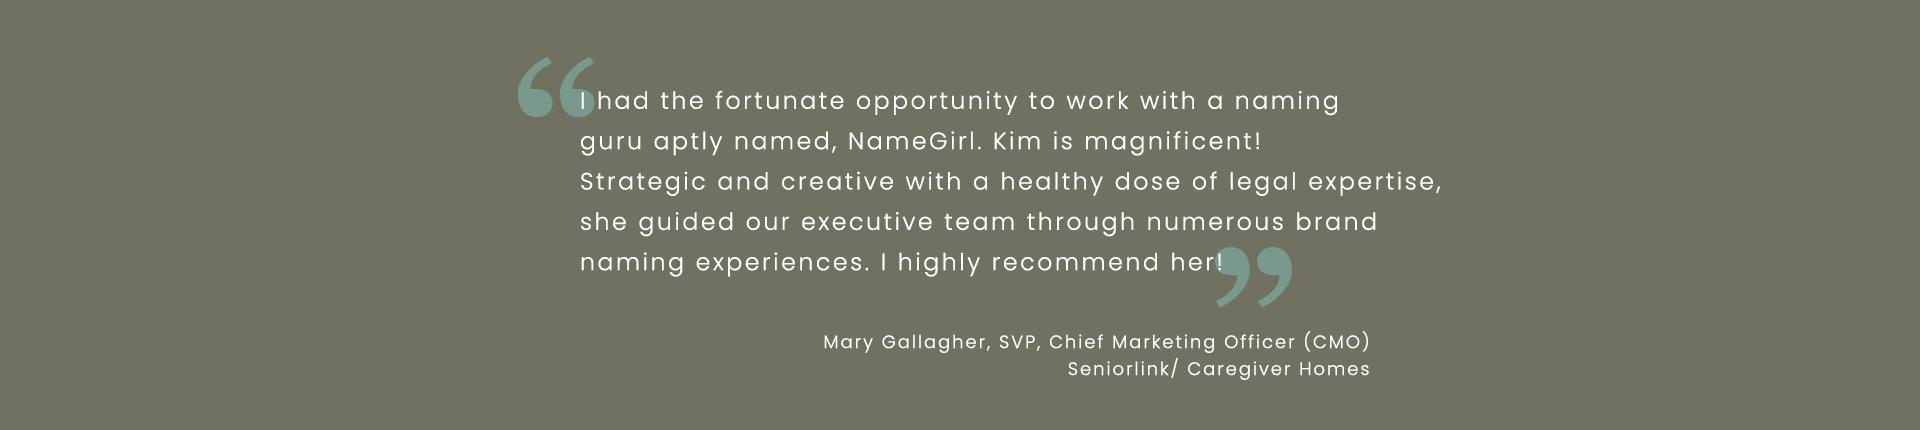 Testimonial Mary Gallagher CMO Vela Care Collaboration Platform SeniorLink